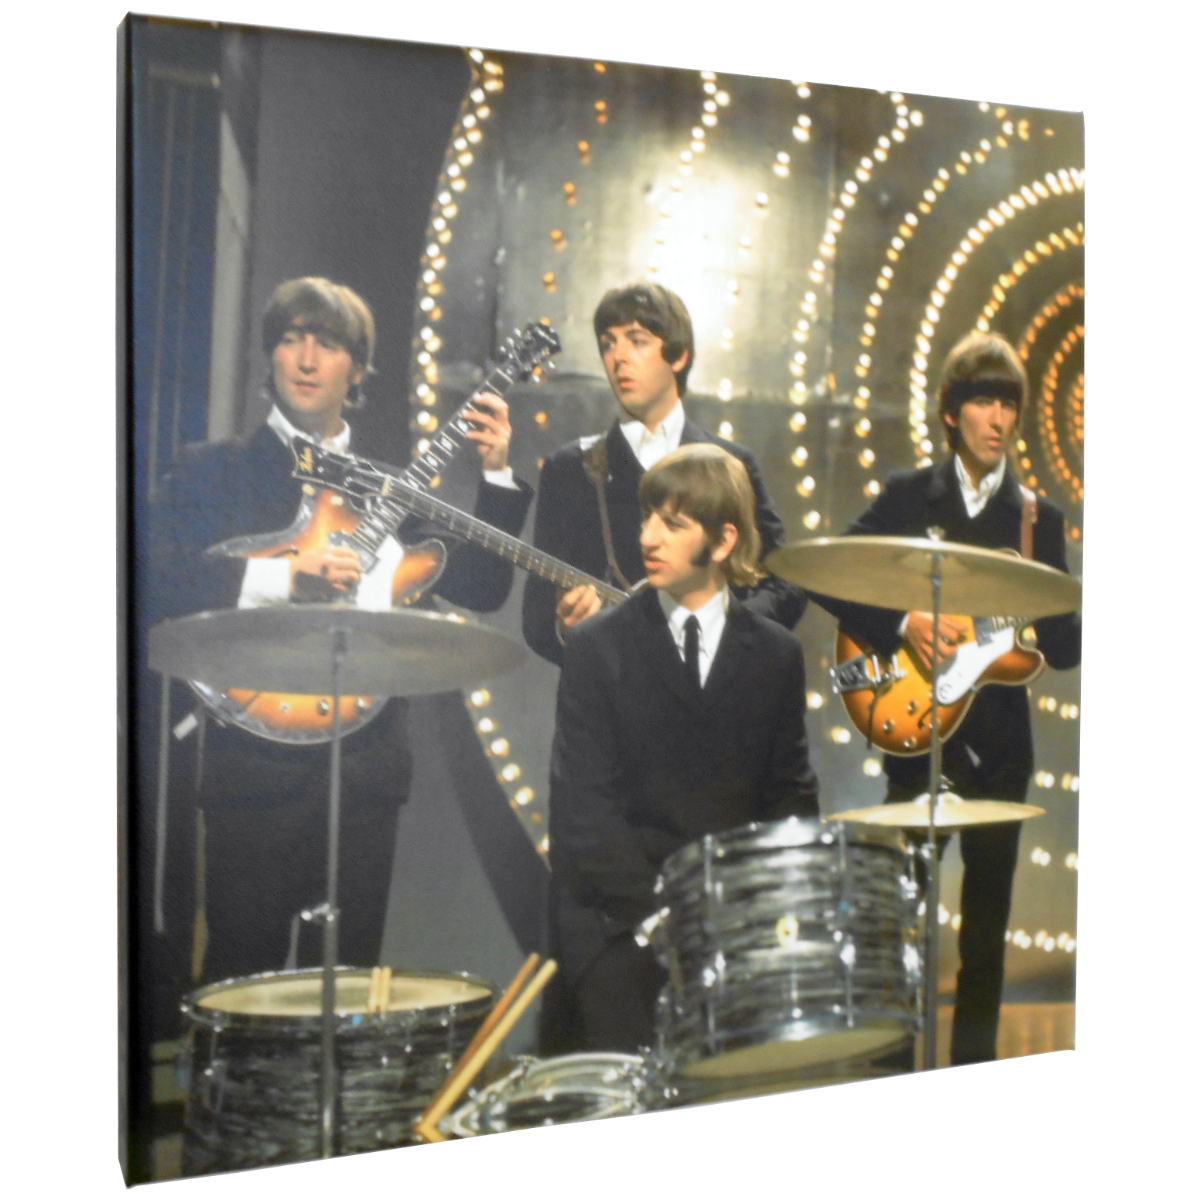 '66 Beatles Top Of The Pops